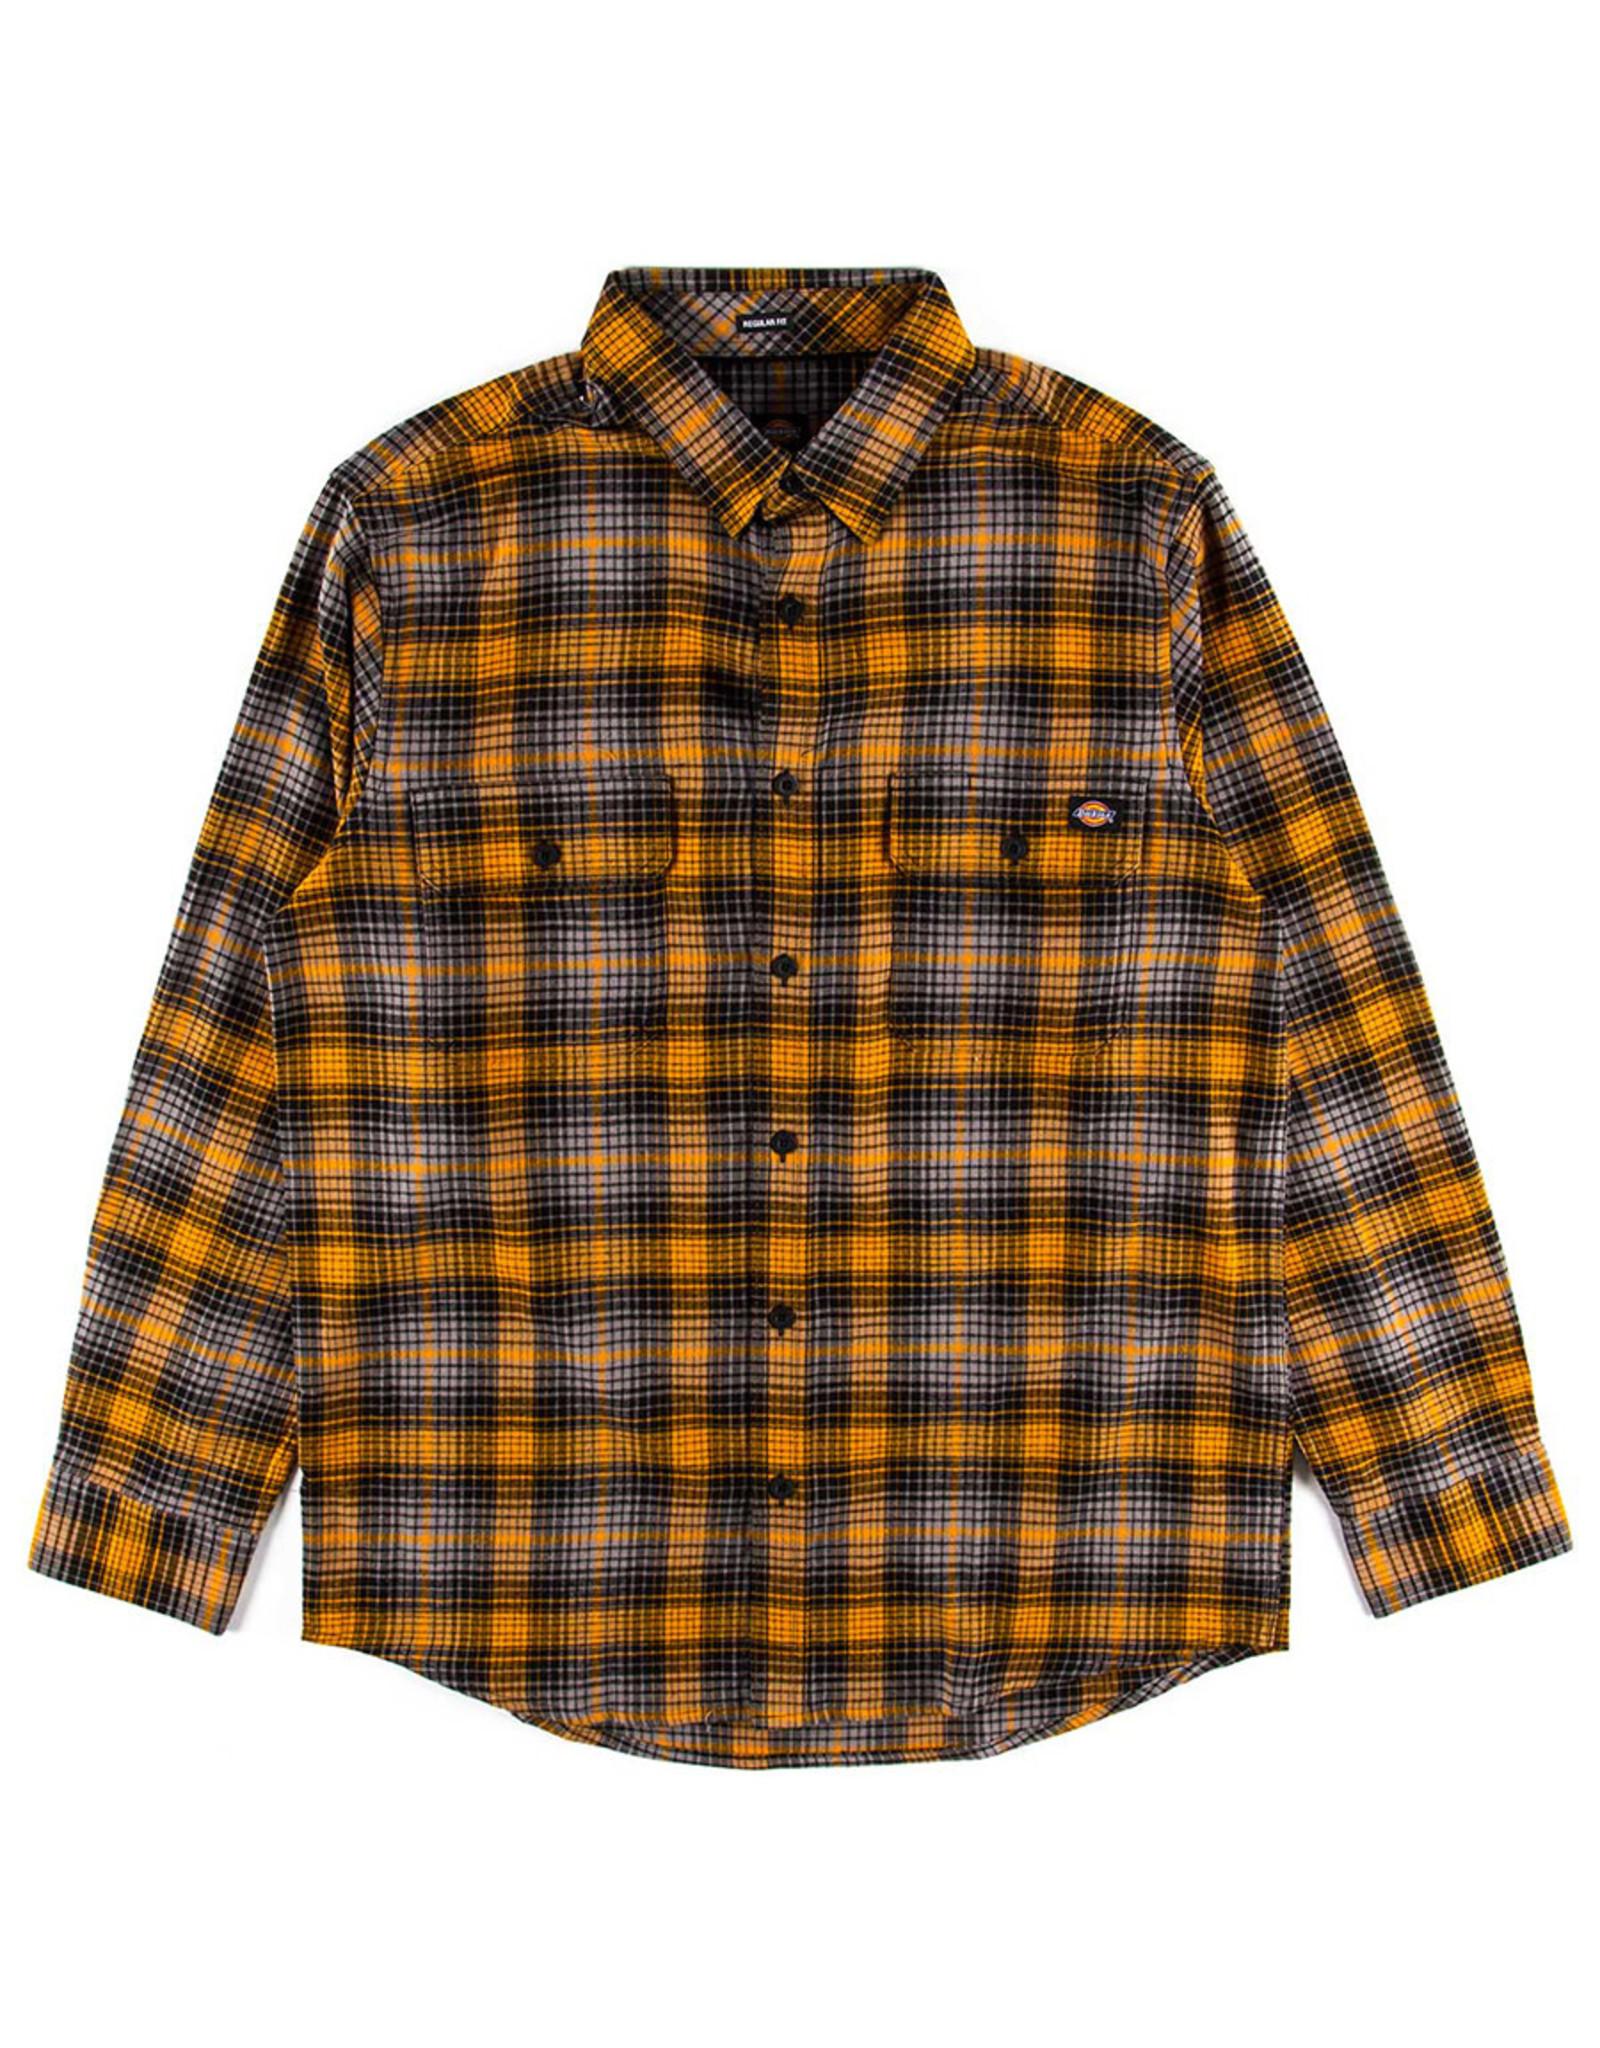 Dickies Dickies Flannel Regular Fit Flex (Autumn Gold/Grey Plaid)